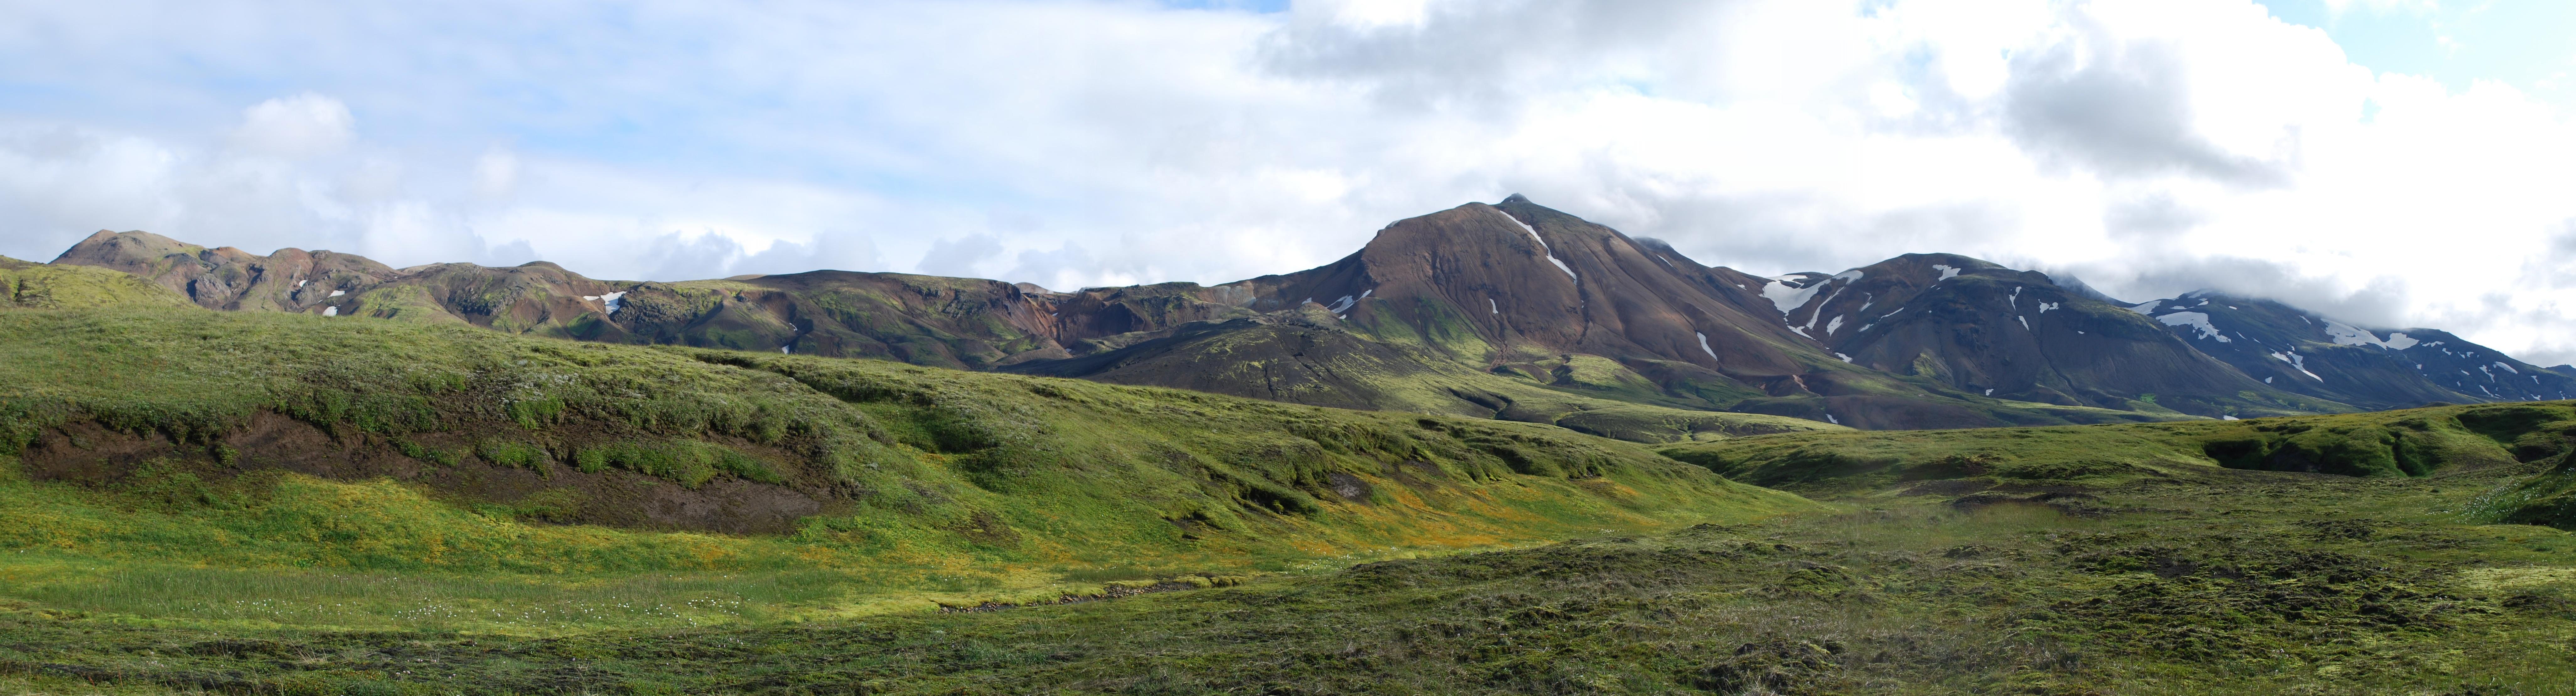 Description Rainbow Mountains in Landmannalaugar region - panorama (1 ...